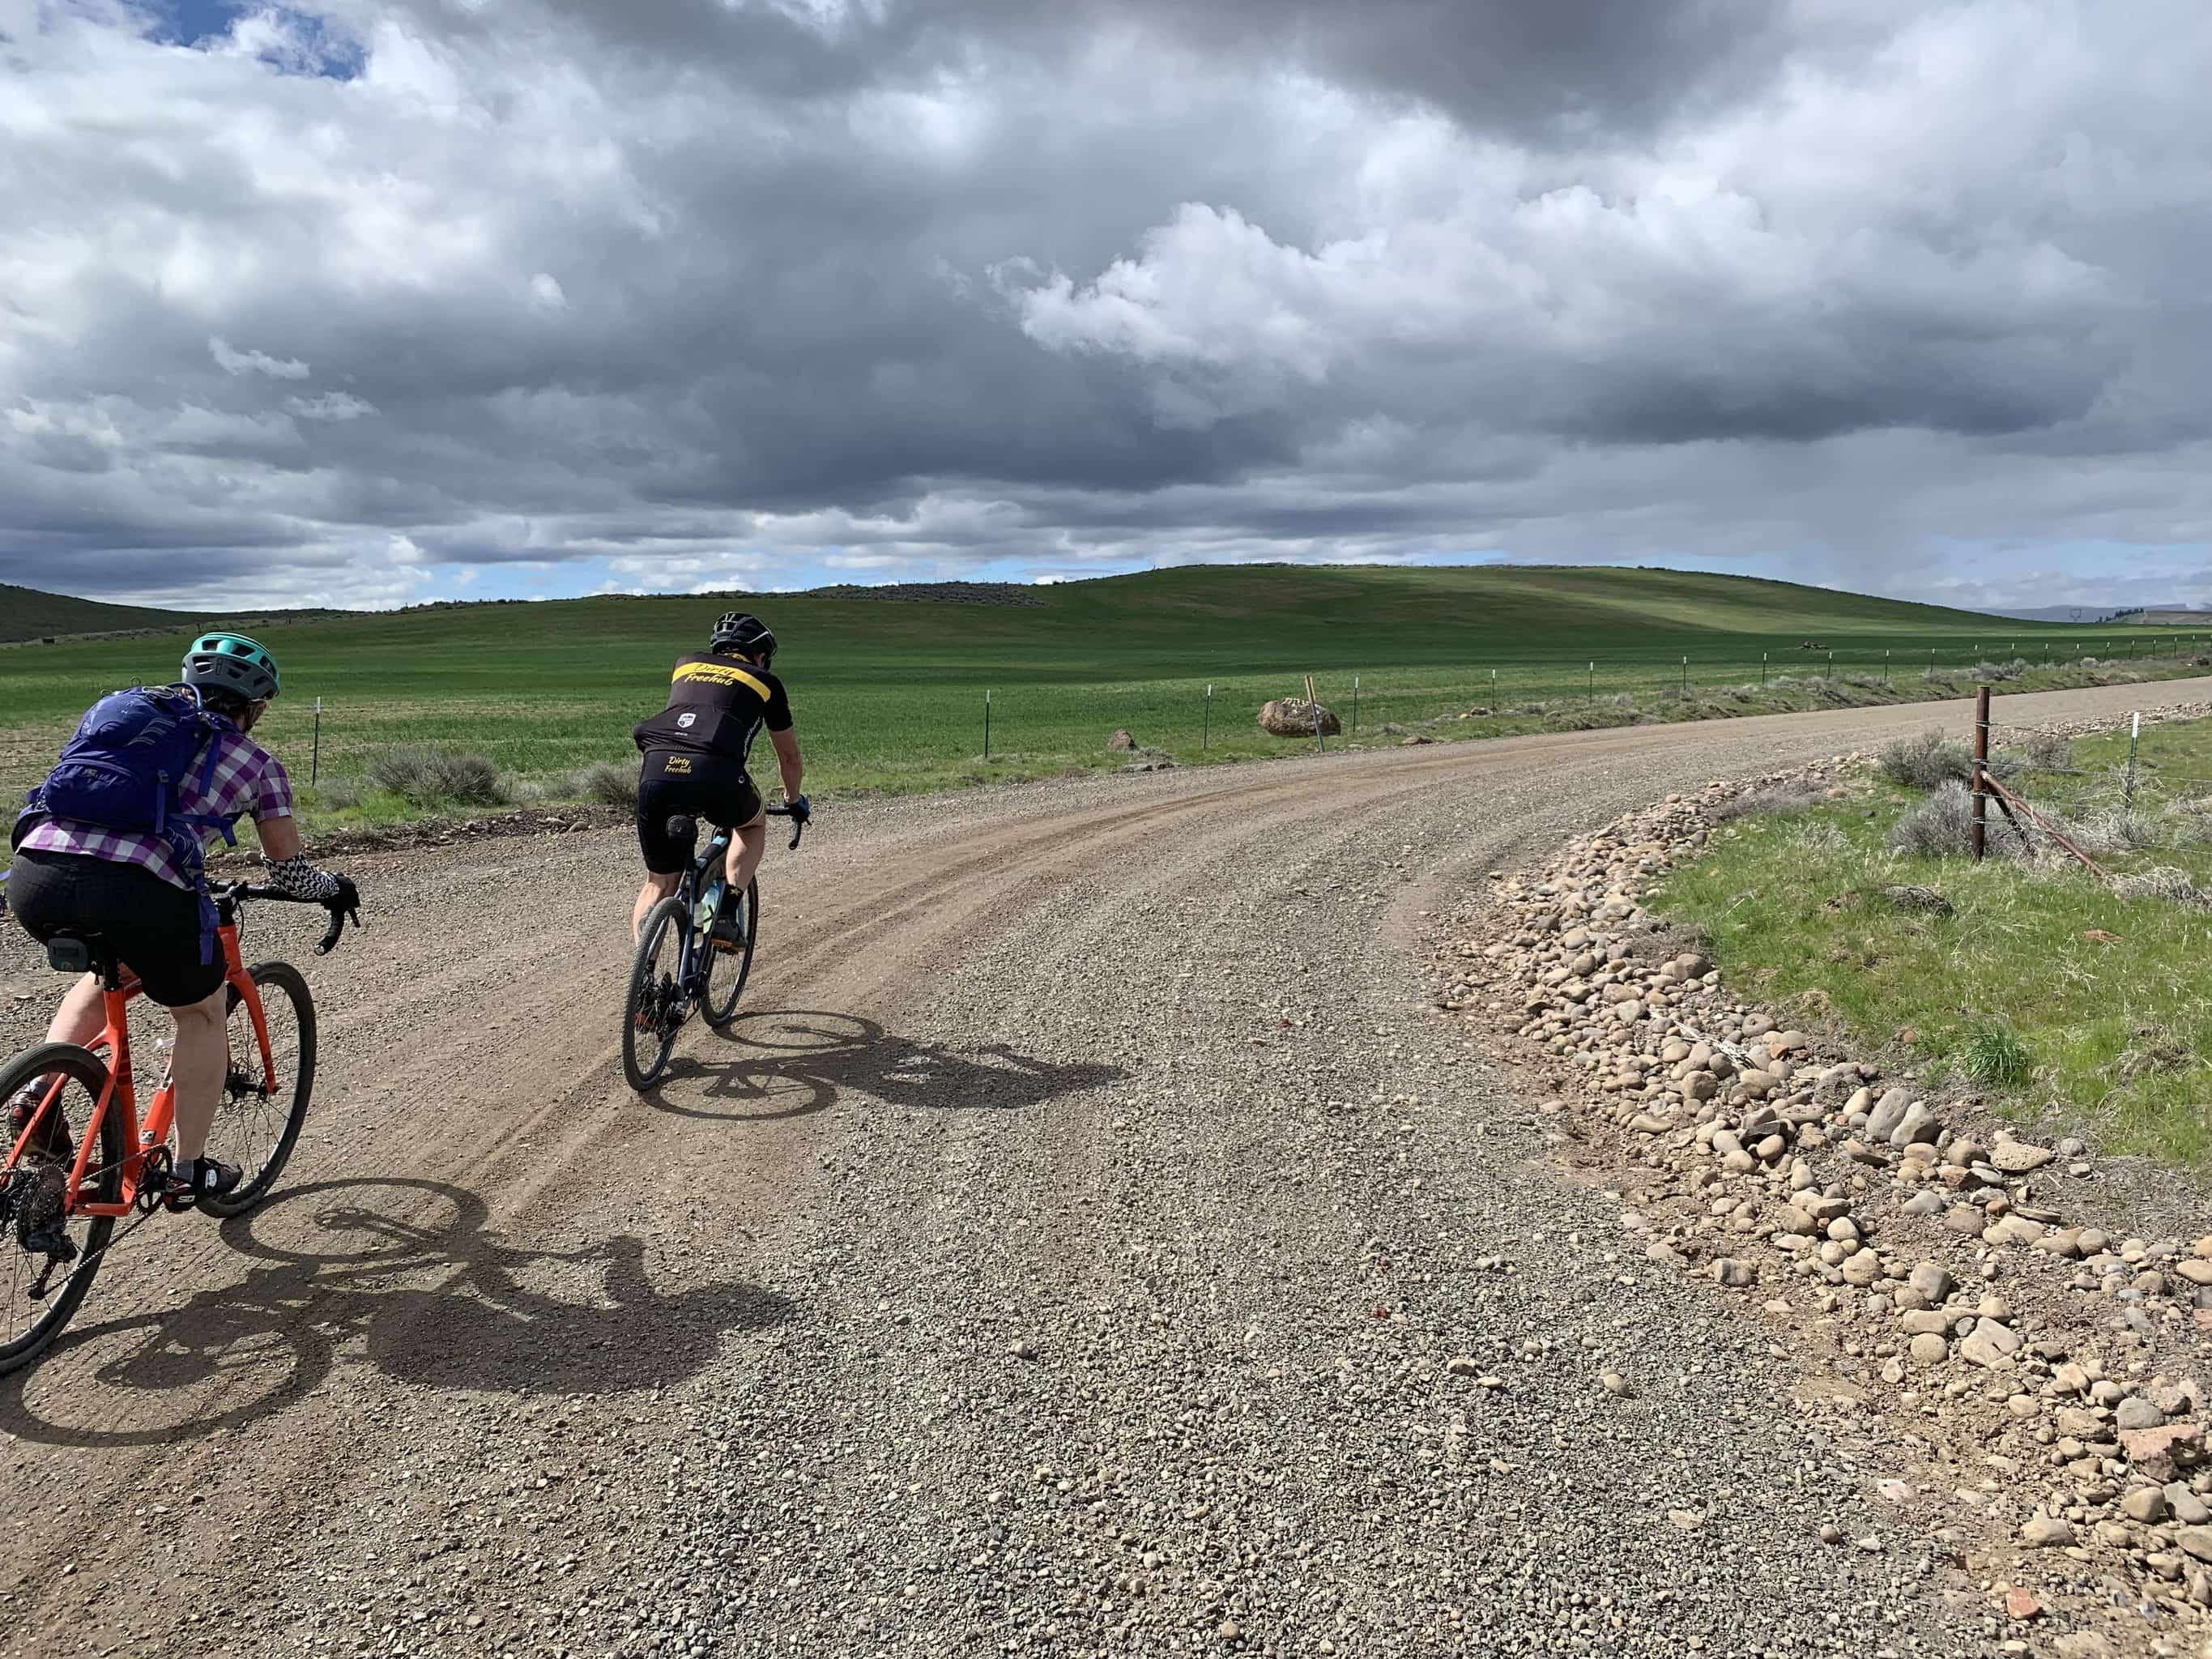 Bike riders on gravel road near Maupin, Oregon.